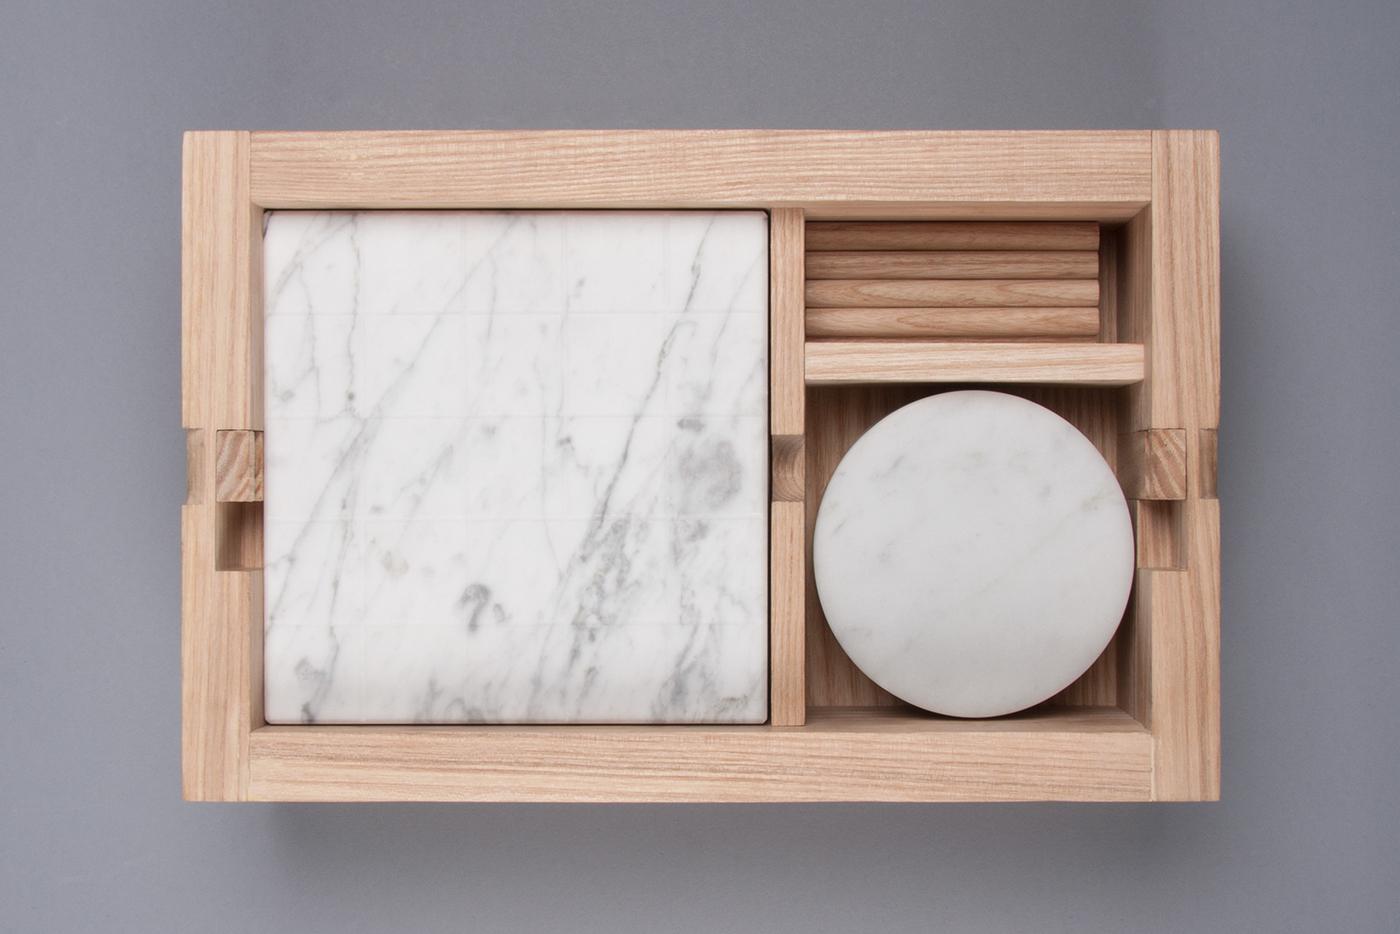 shkatulka izba project izba storage kit casket